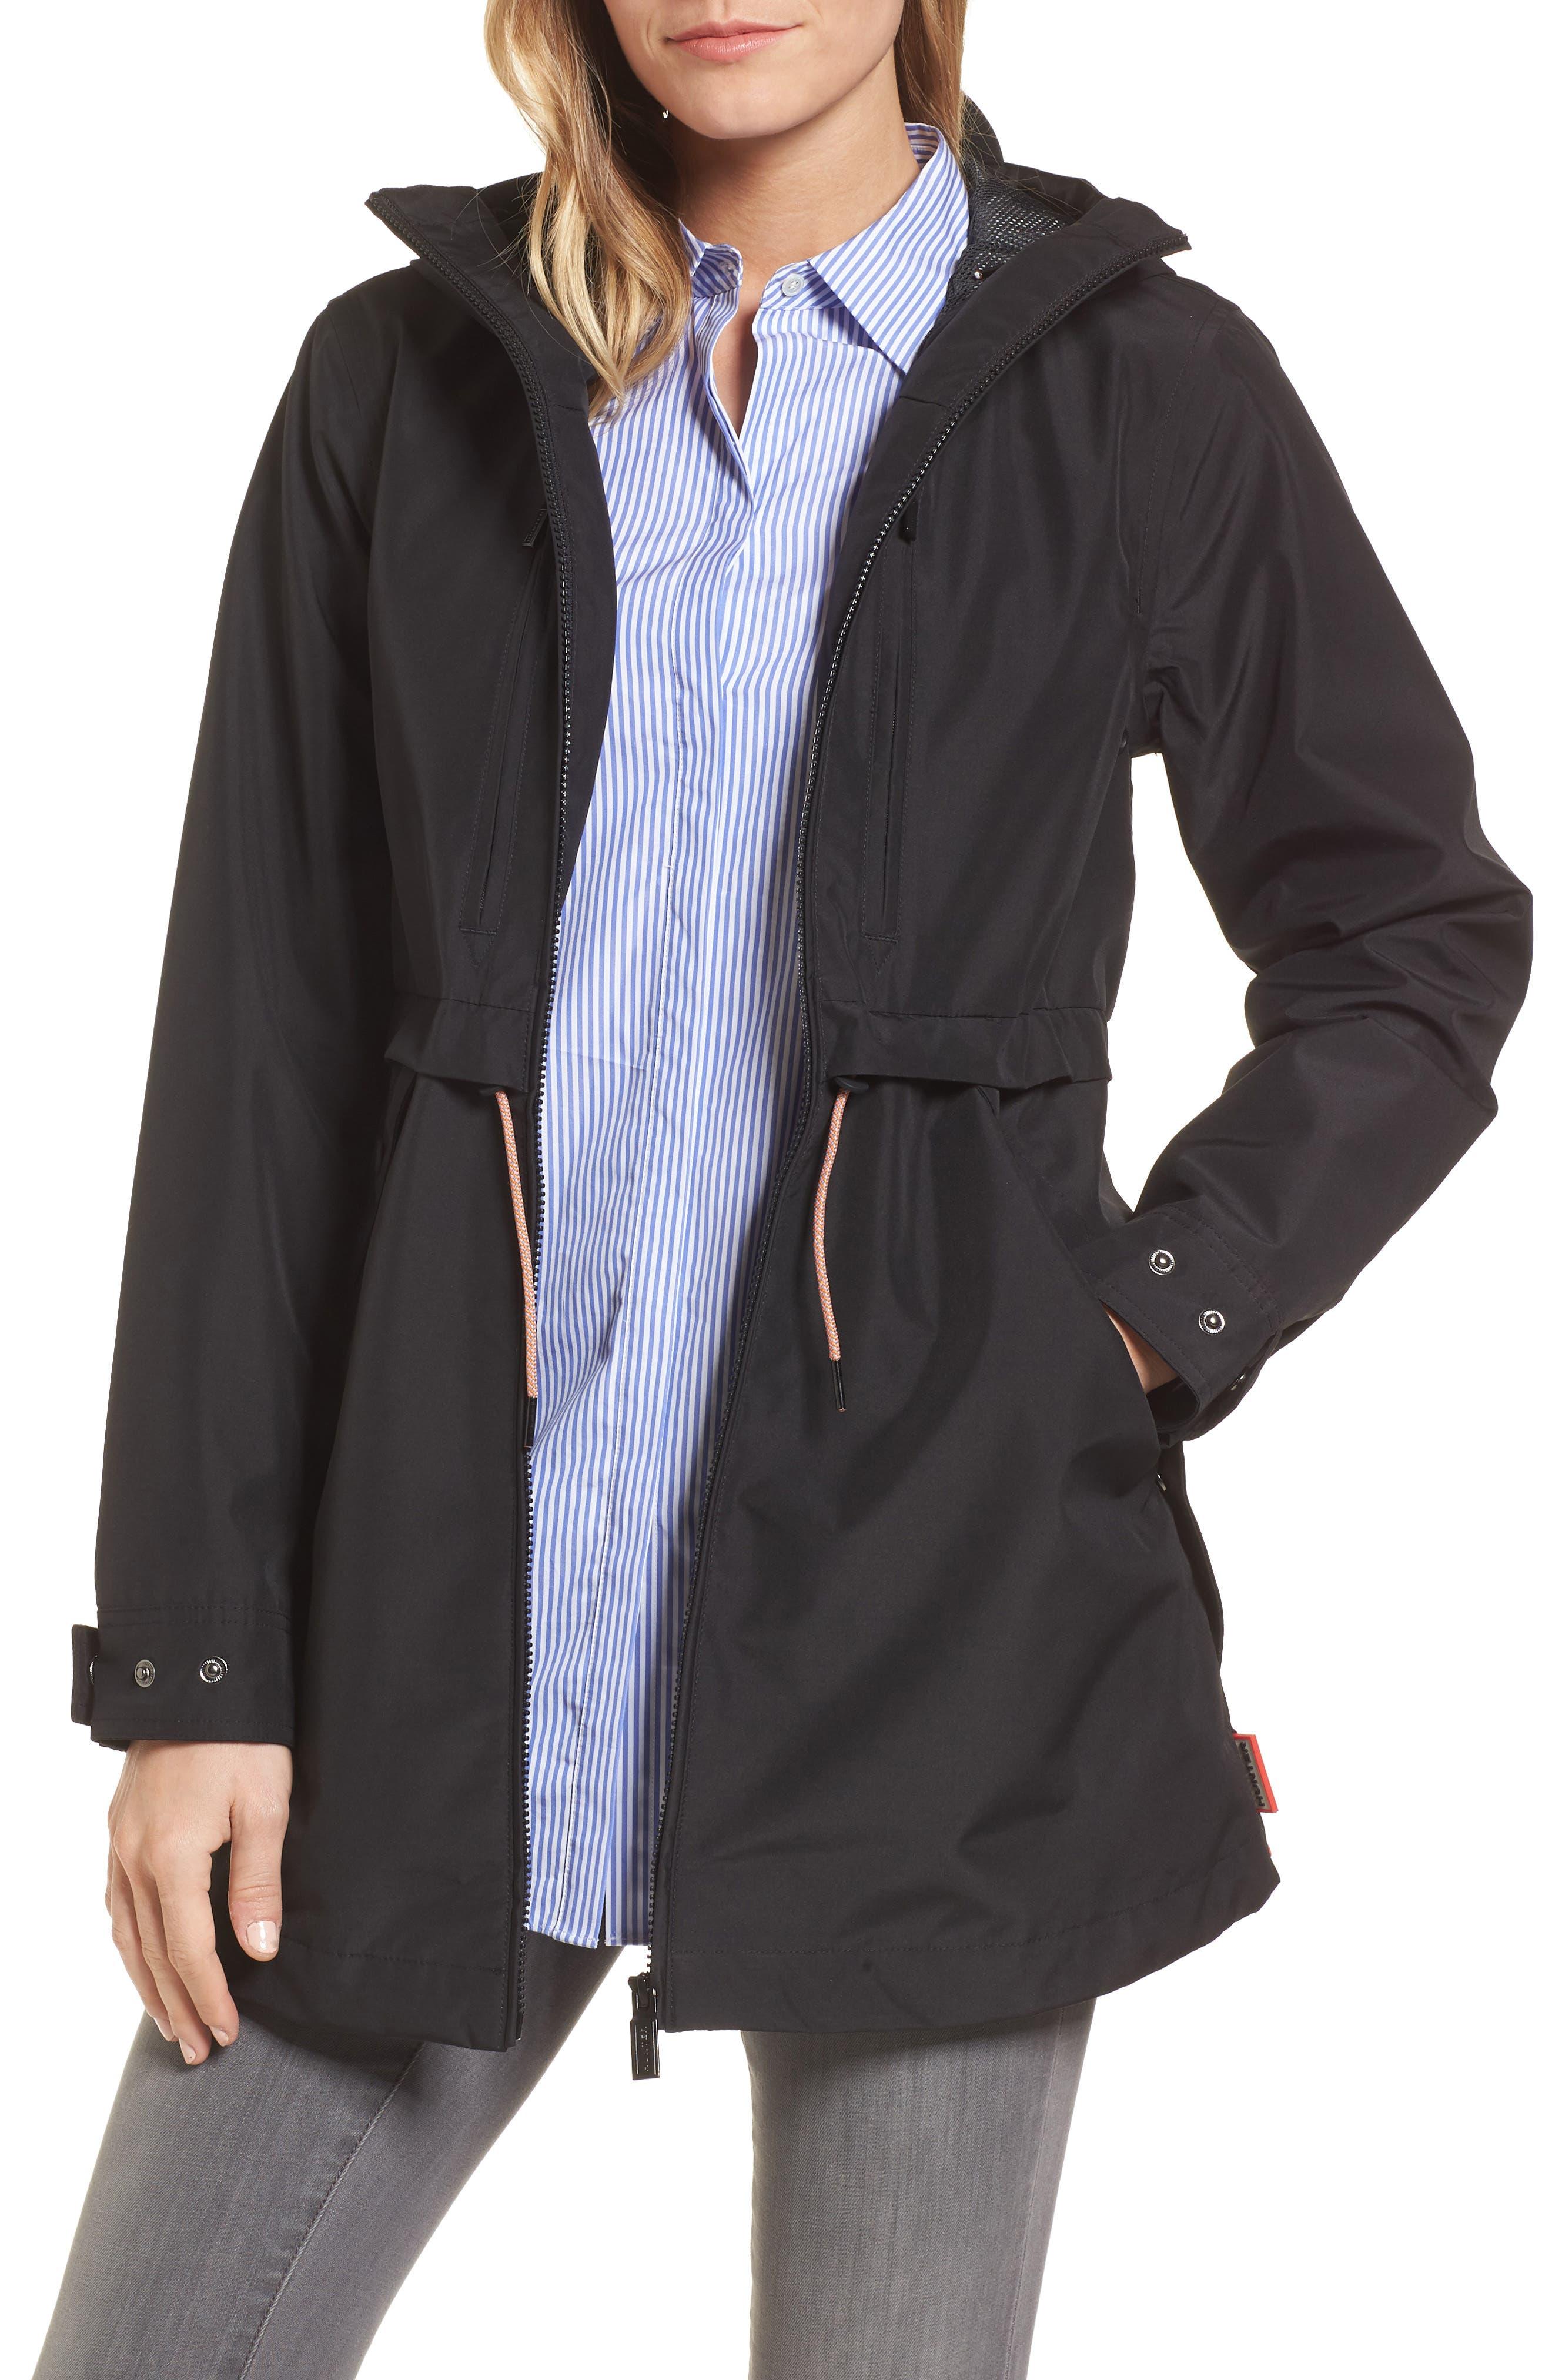 Main Image - Hunter Original 3-Layer Waterproof Anorak Jacket